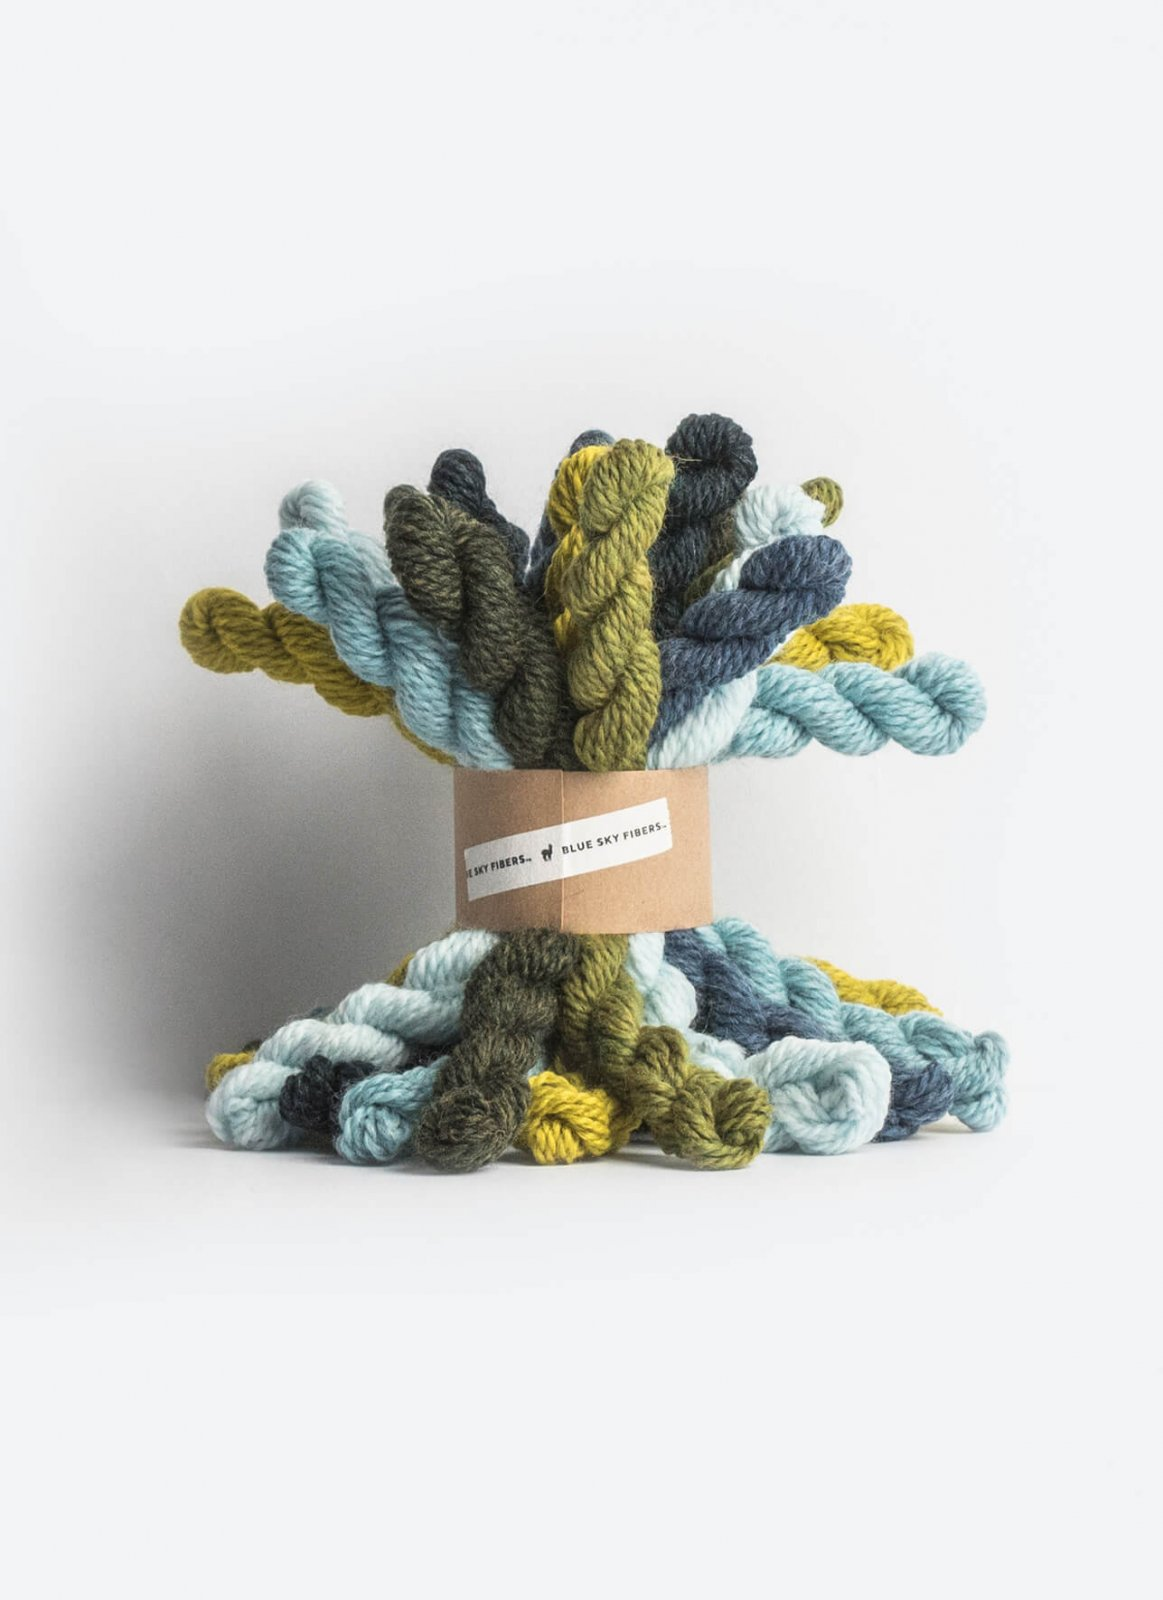 Woolstok Bundle Kit - Cool